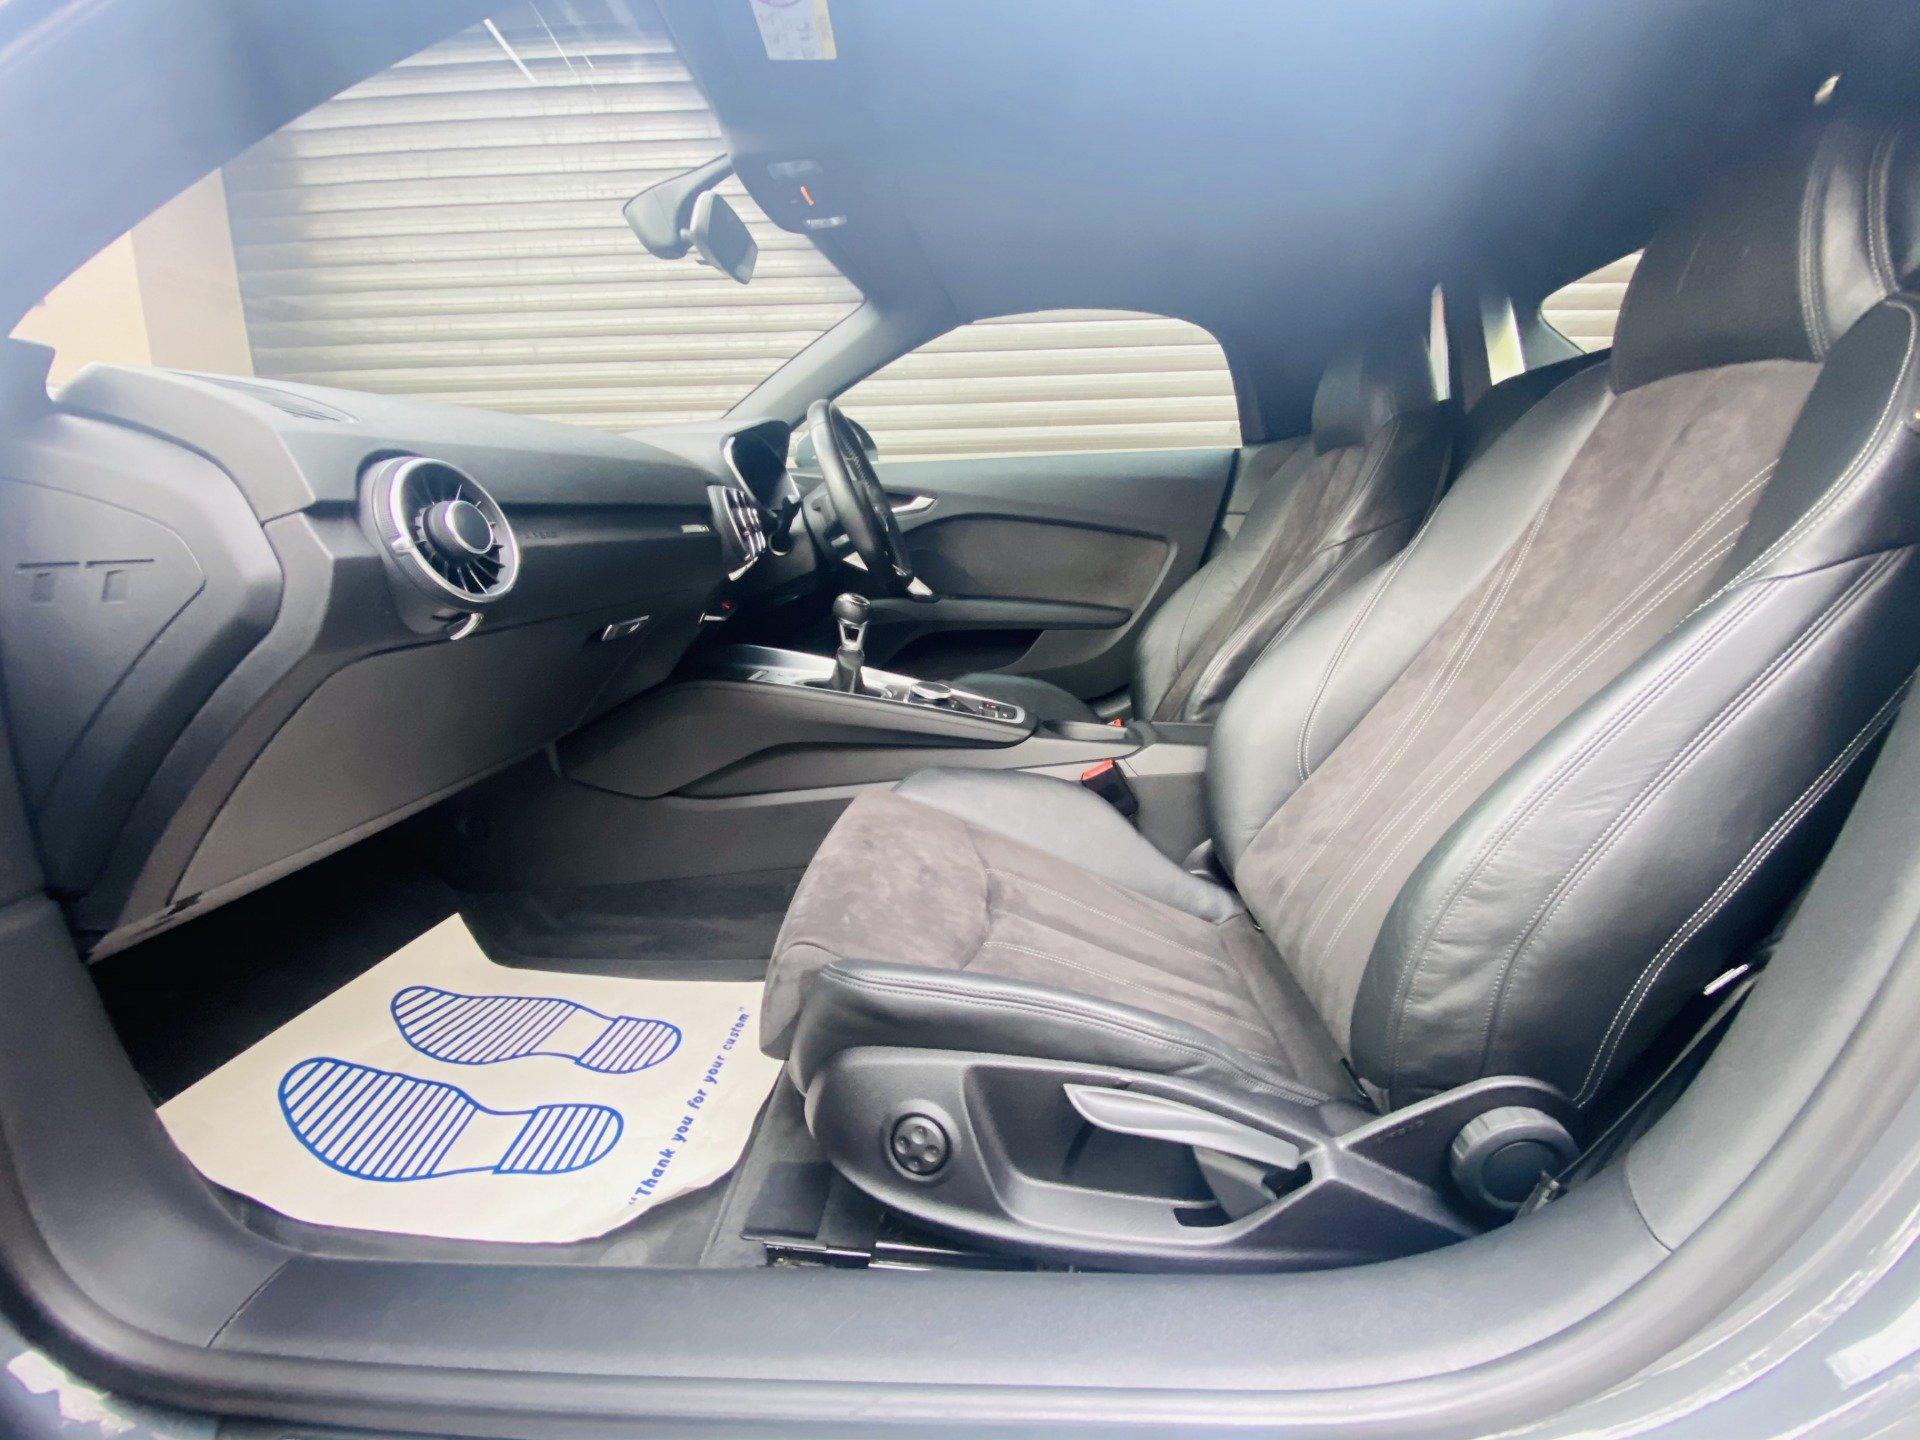 2016 (65) Audi TT 1.8 TFSI S line Roadster 2dr - Seraph Cars